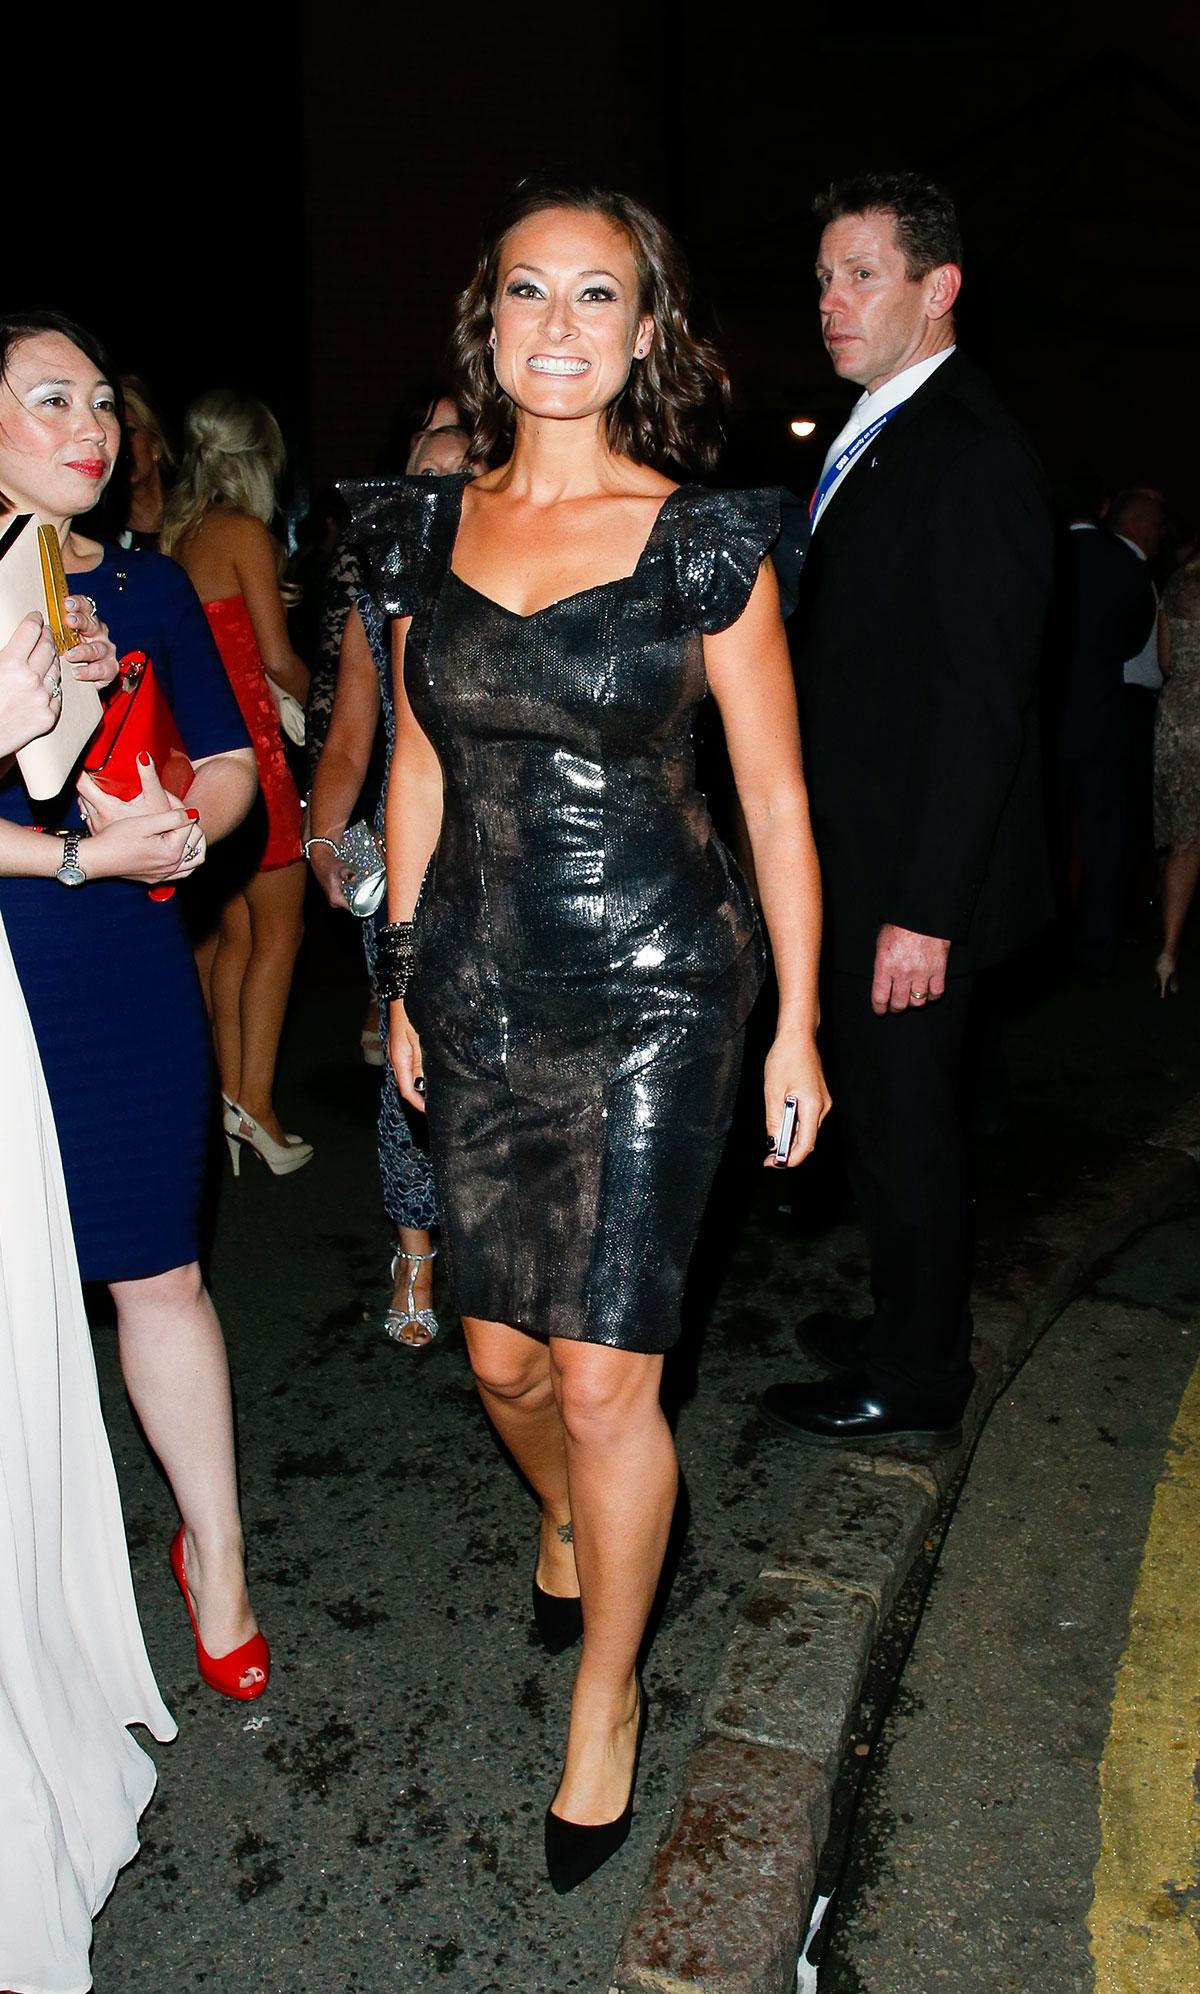 Luisa Bradshaw White leaves the British soap awards